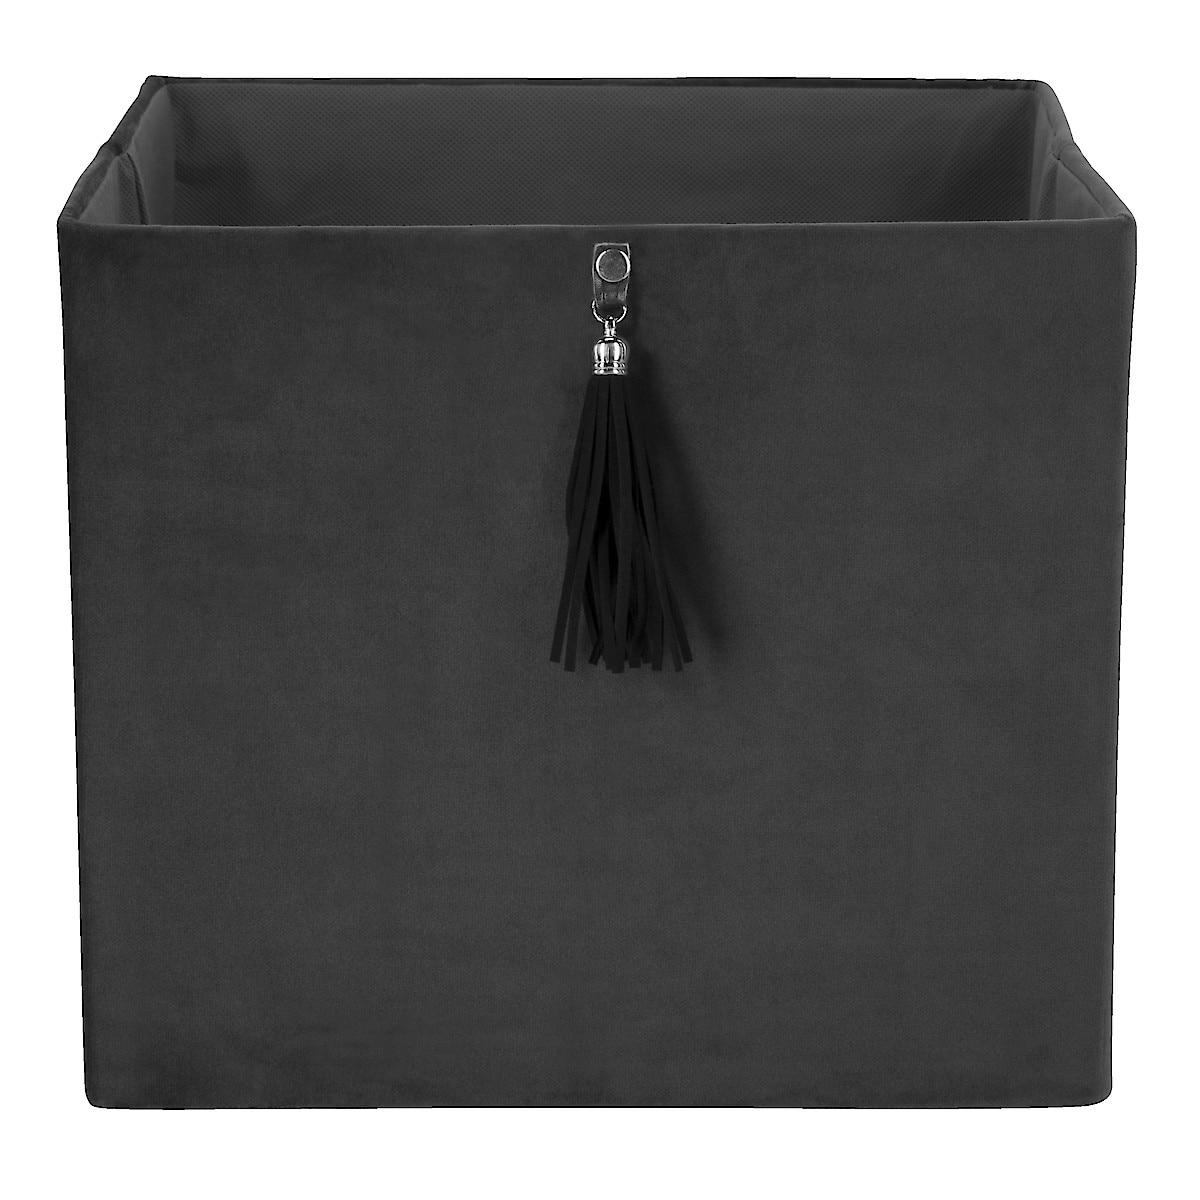 Aufbewahrungsbox Quadrat